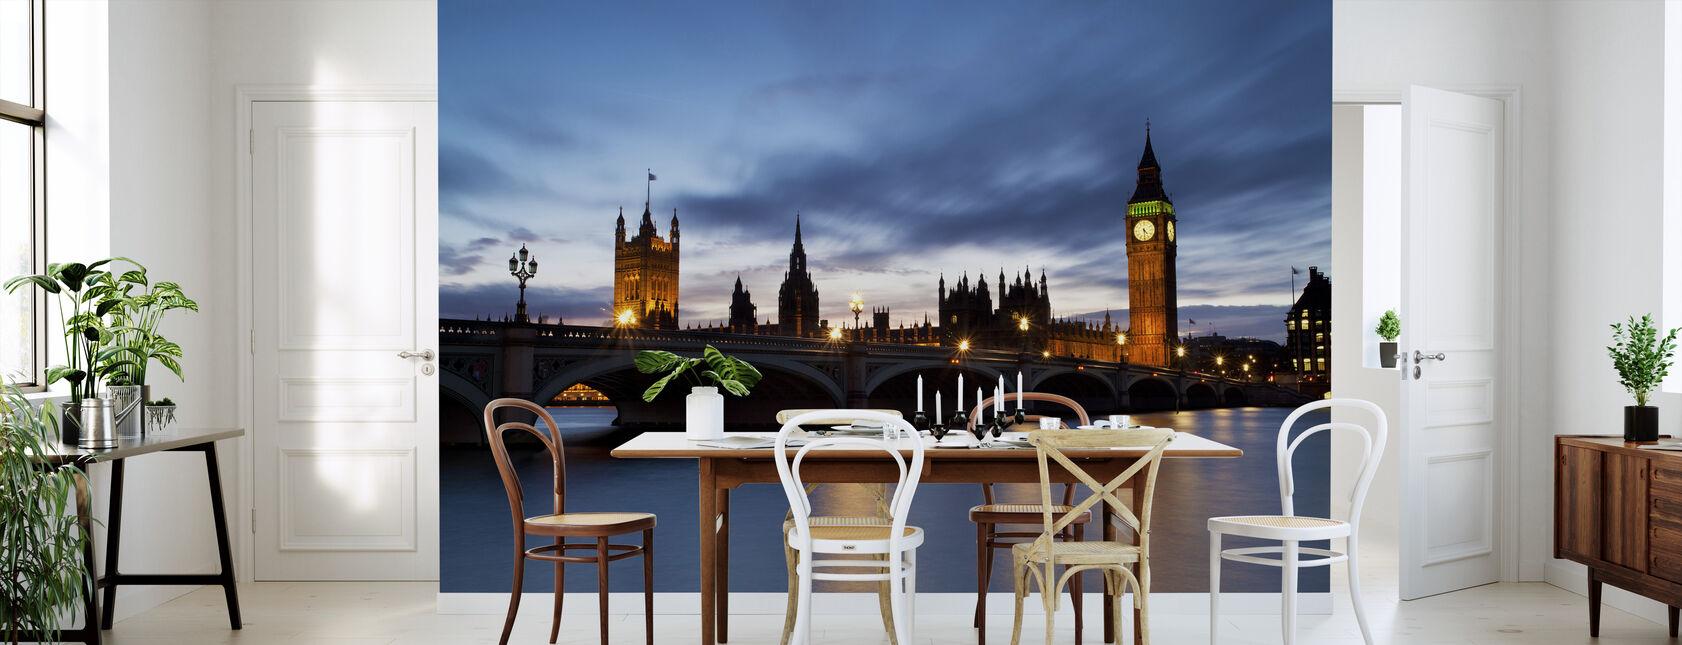 Westminsterbron på natten - Tapet - Kök